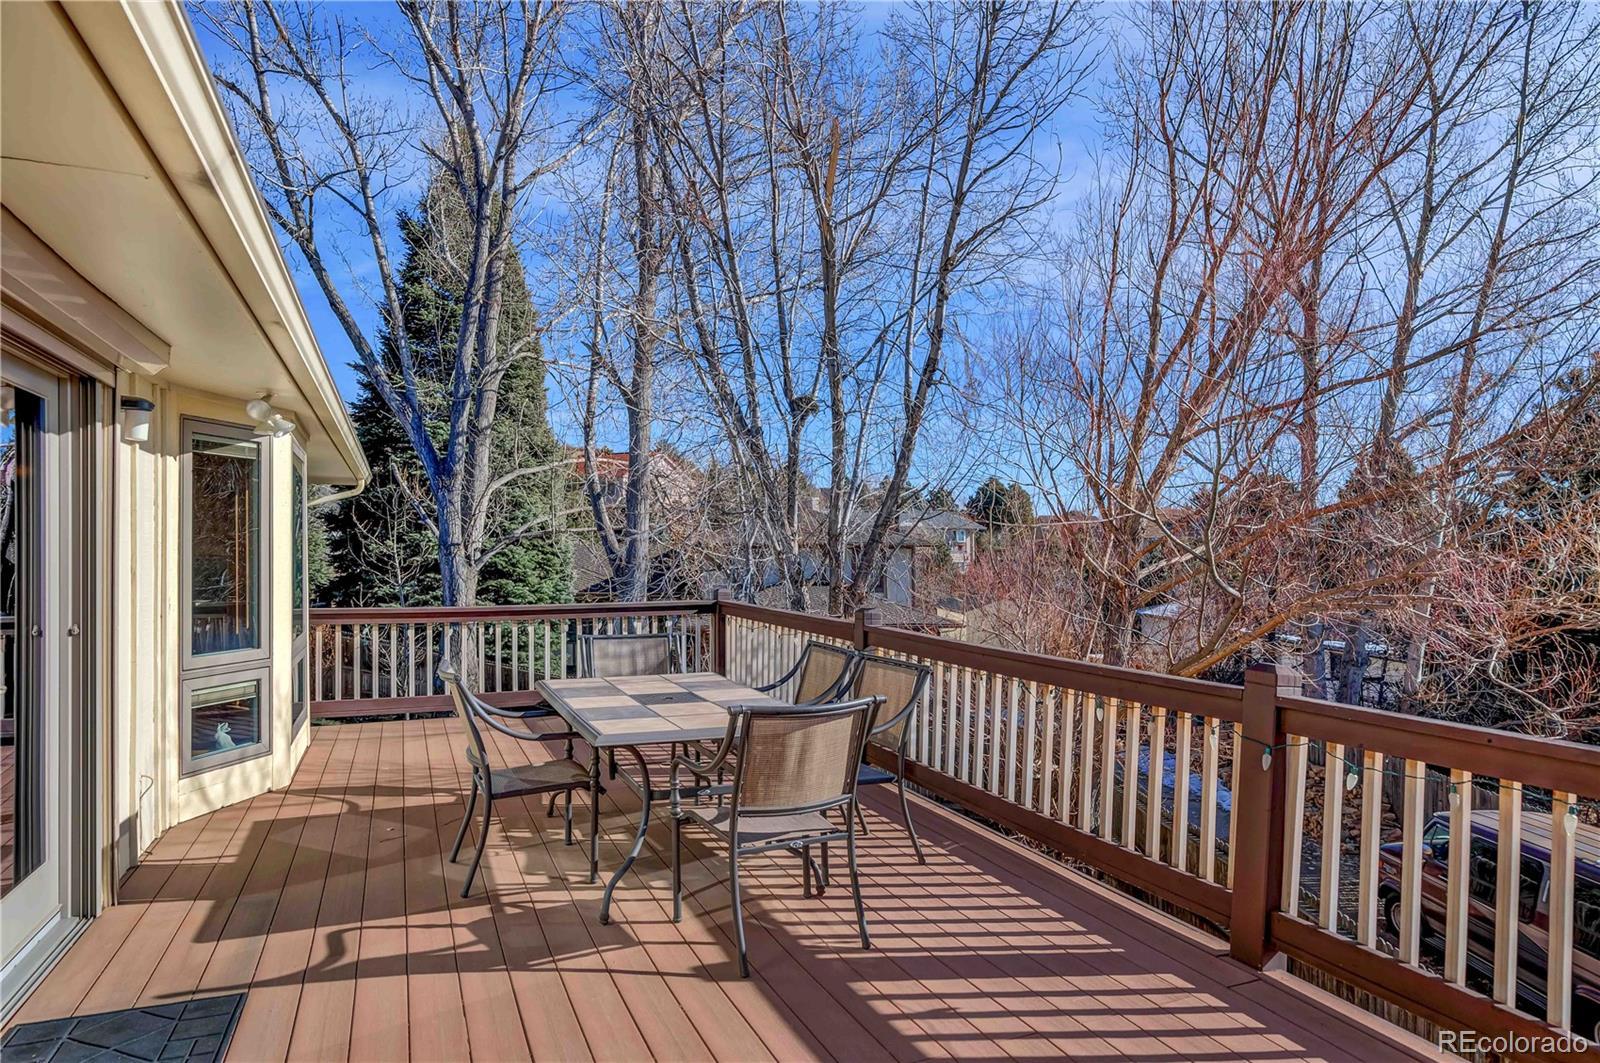 MLS# 5539974 - 32 - 5505 Saddle Rock Place, Colorado Springs, CO 80918